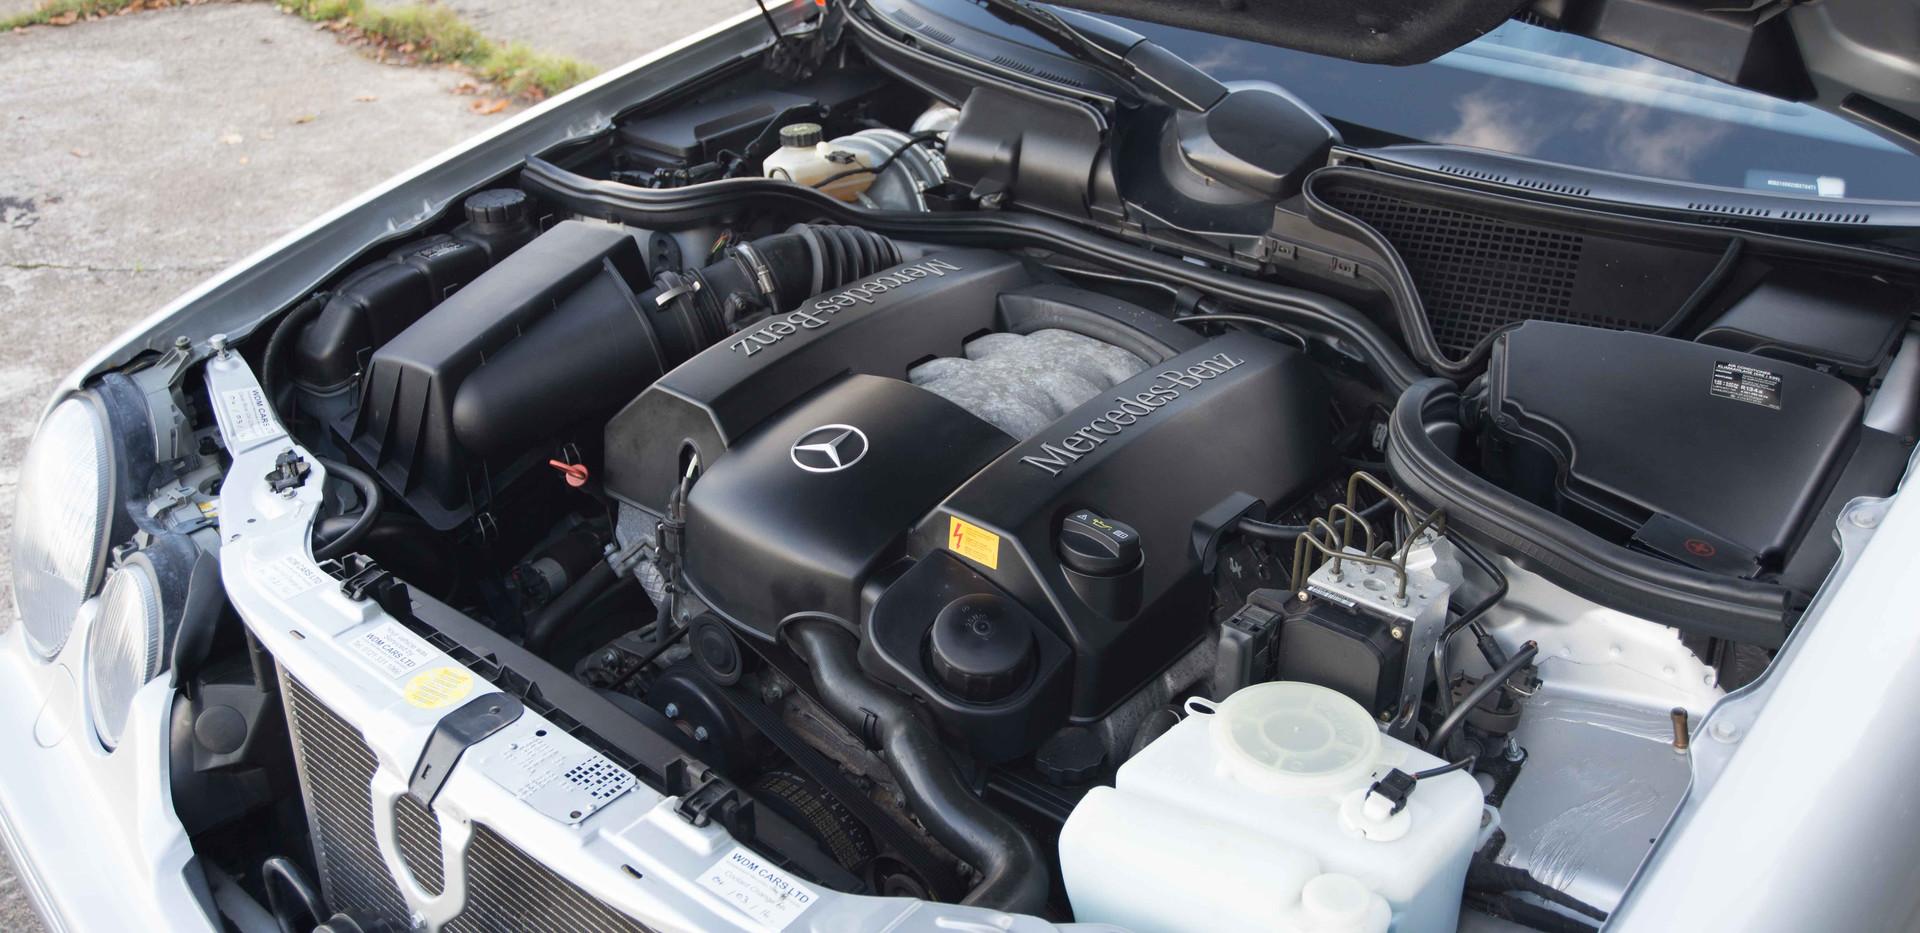 Mercedes E240 For Sale UK London  (78 of